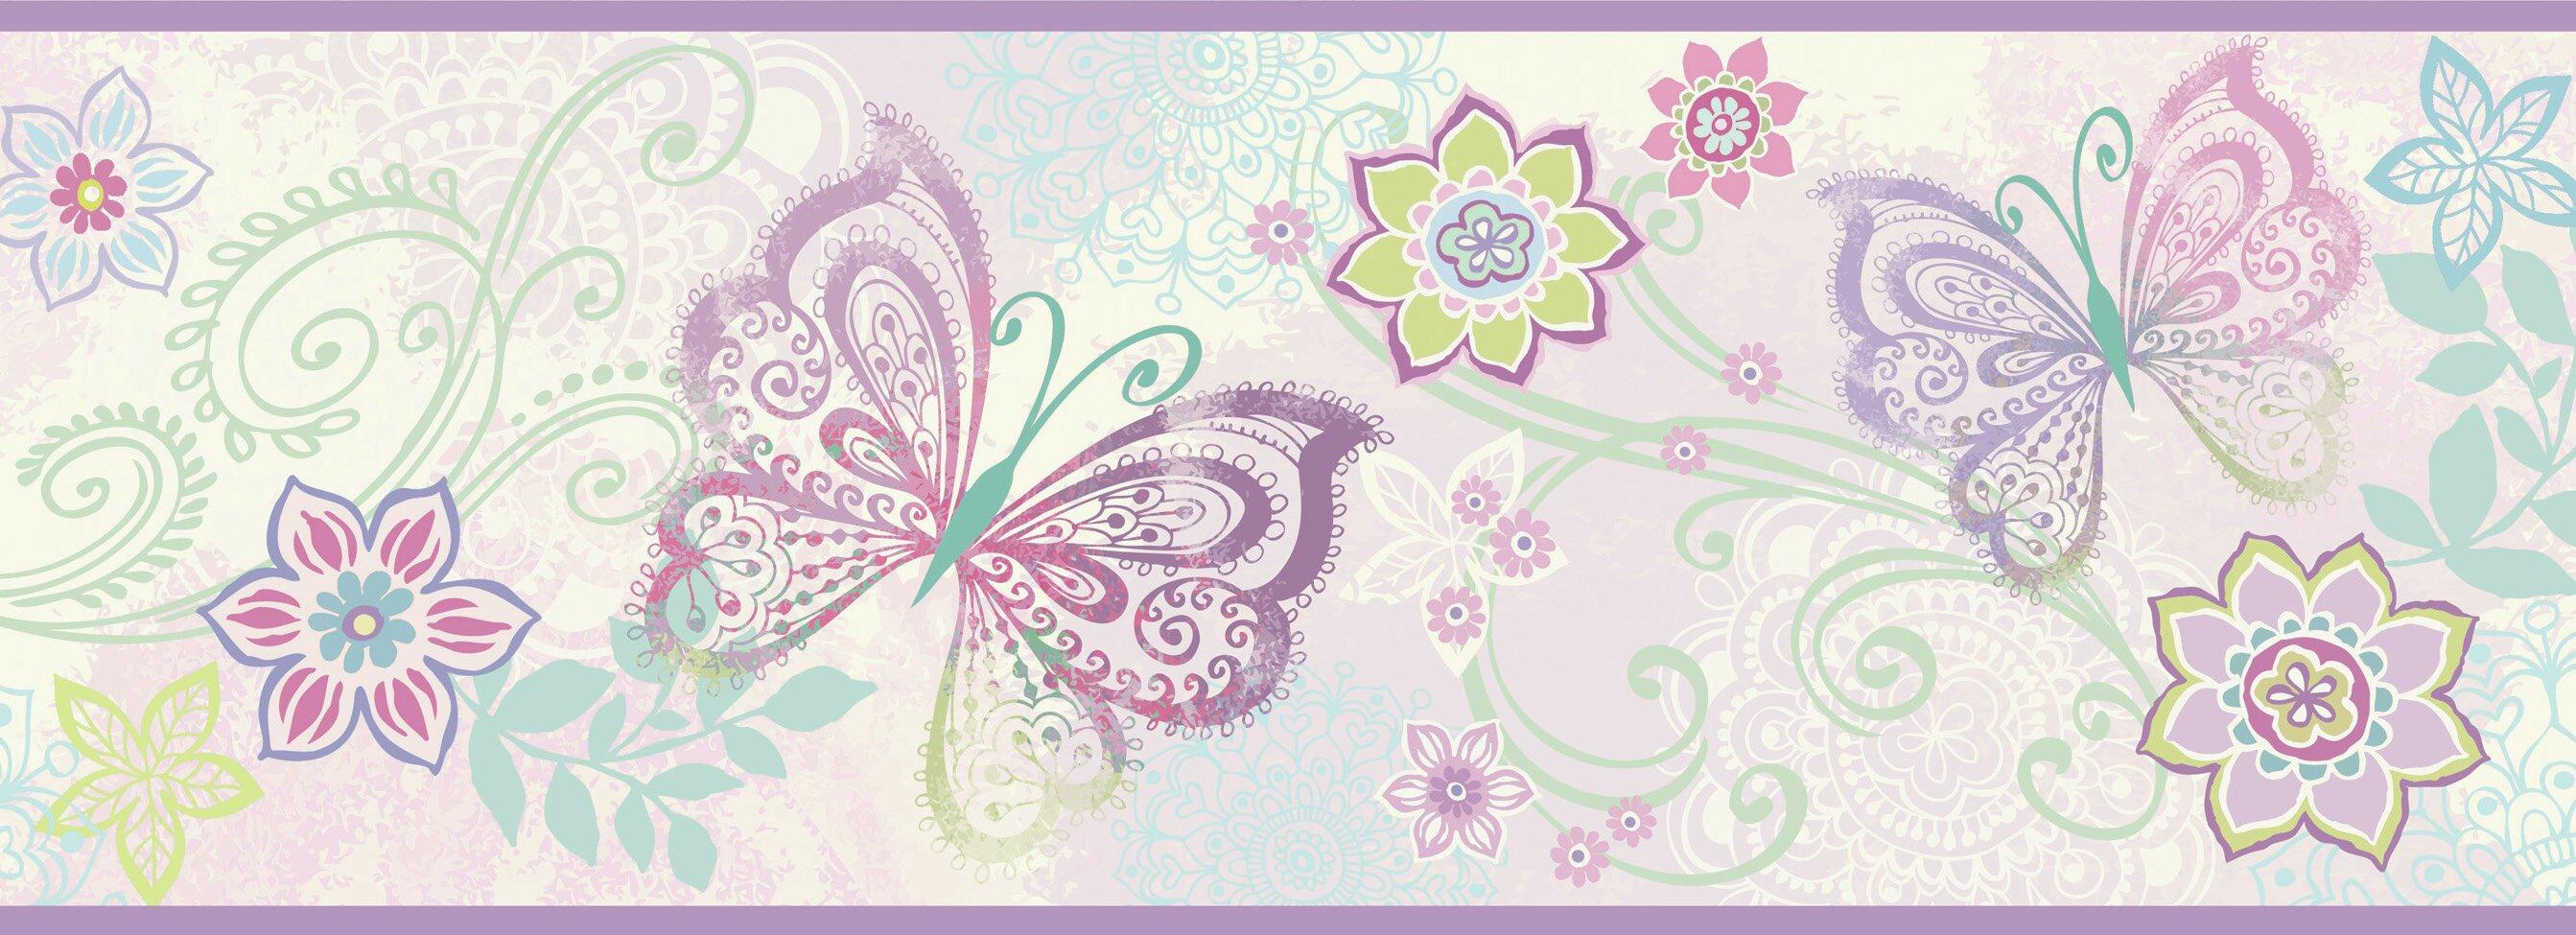 Zoomie Kids Melnick Boho Butterflies 15 X 6 5 Floral Border